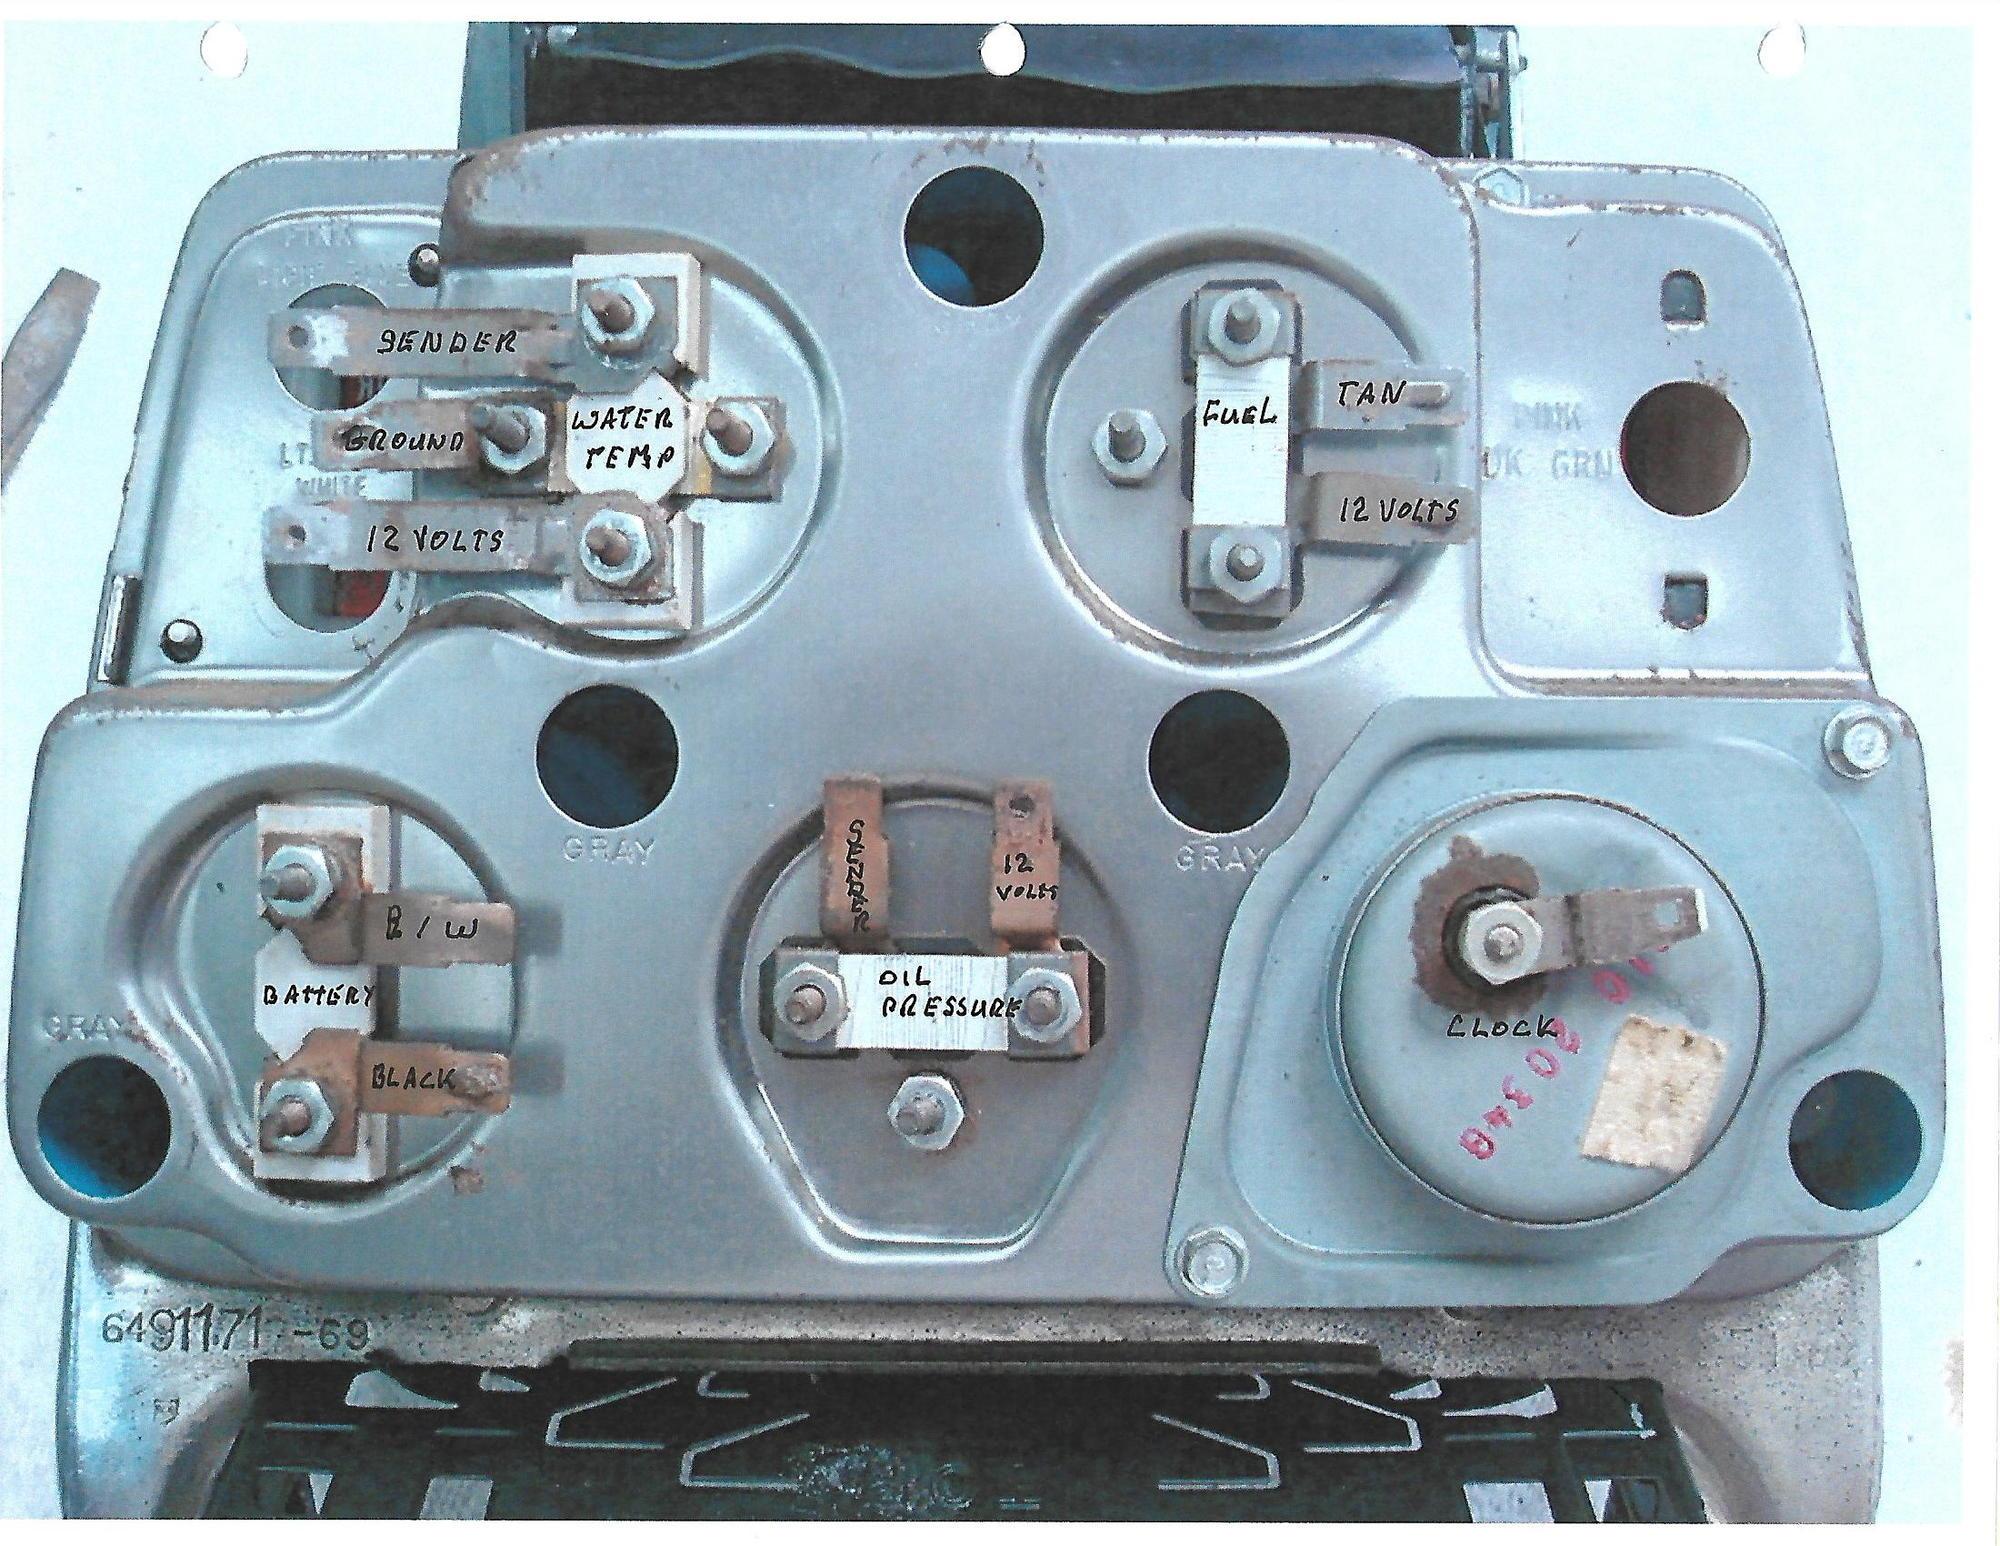 Instrument Panel Wiring Harness Diagram 1970 Corvette - Corvetteforum